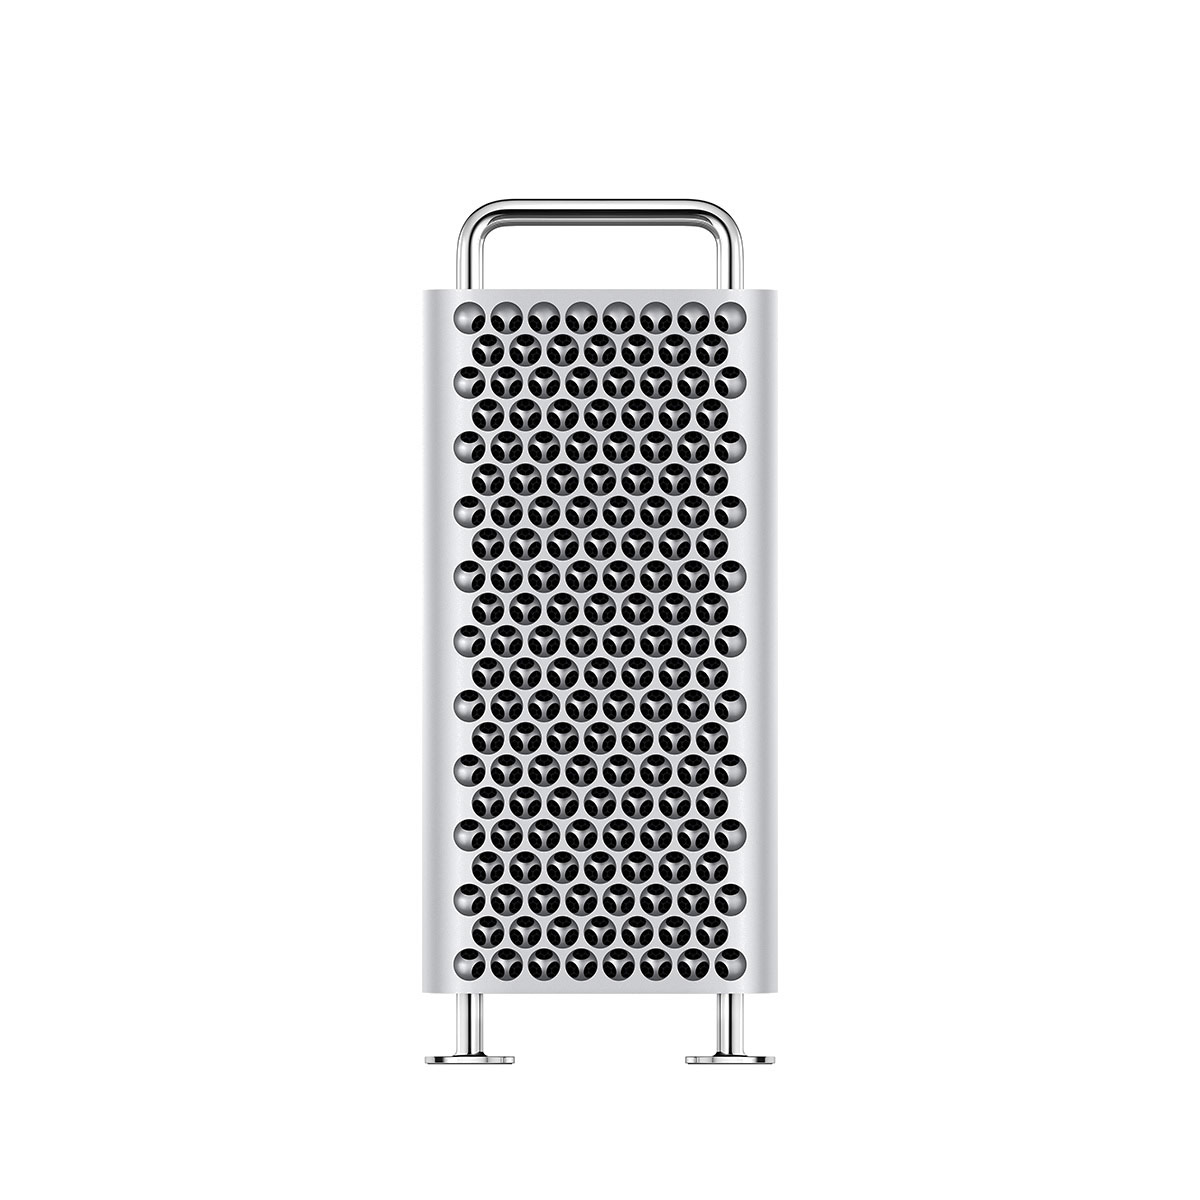 Mac Pro Tower 3.3GHZ 12 core Xeon W 32GB 2TB VEGA II DUO Afterburner